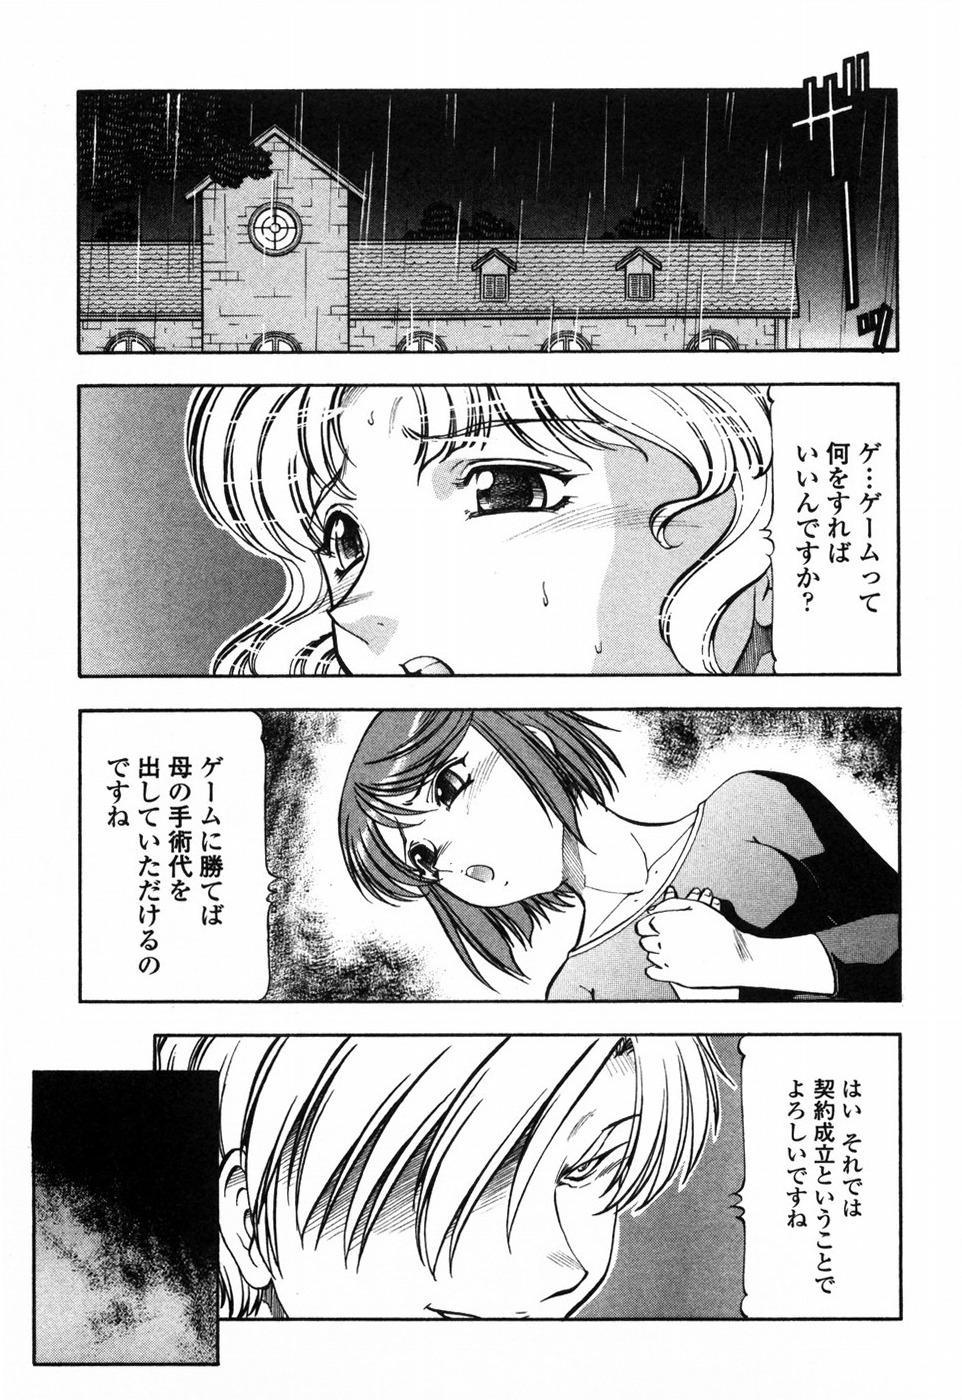 Kichiku Houteishiki - Equation of brutal person 119